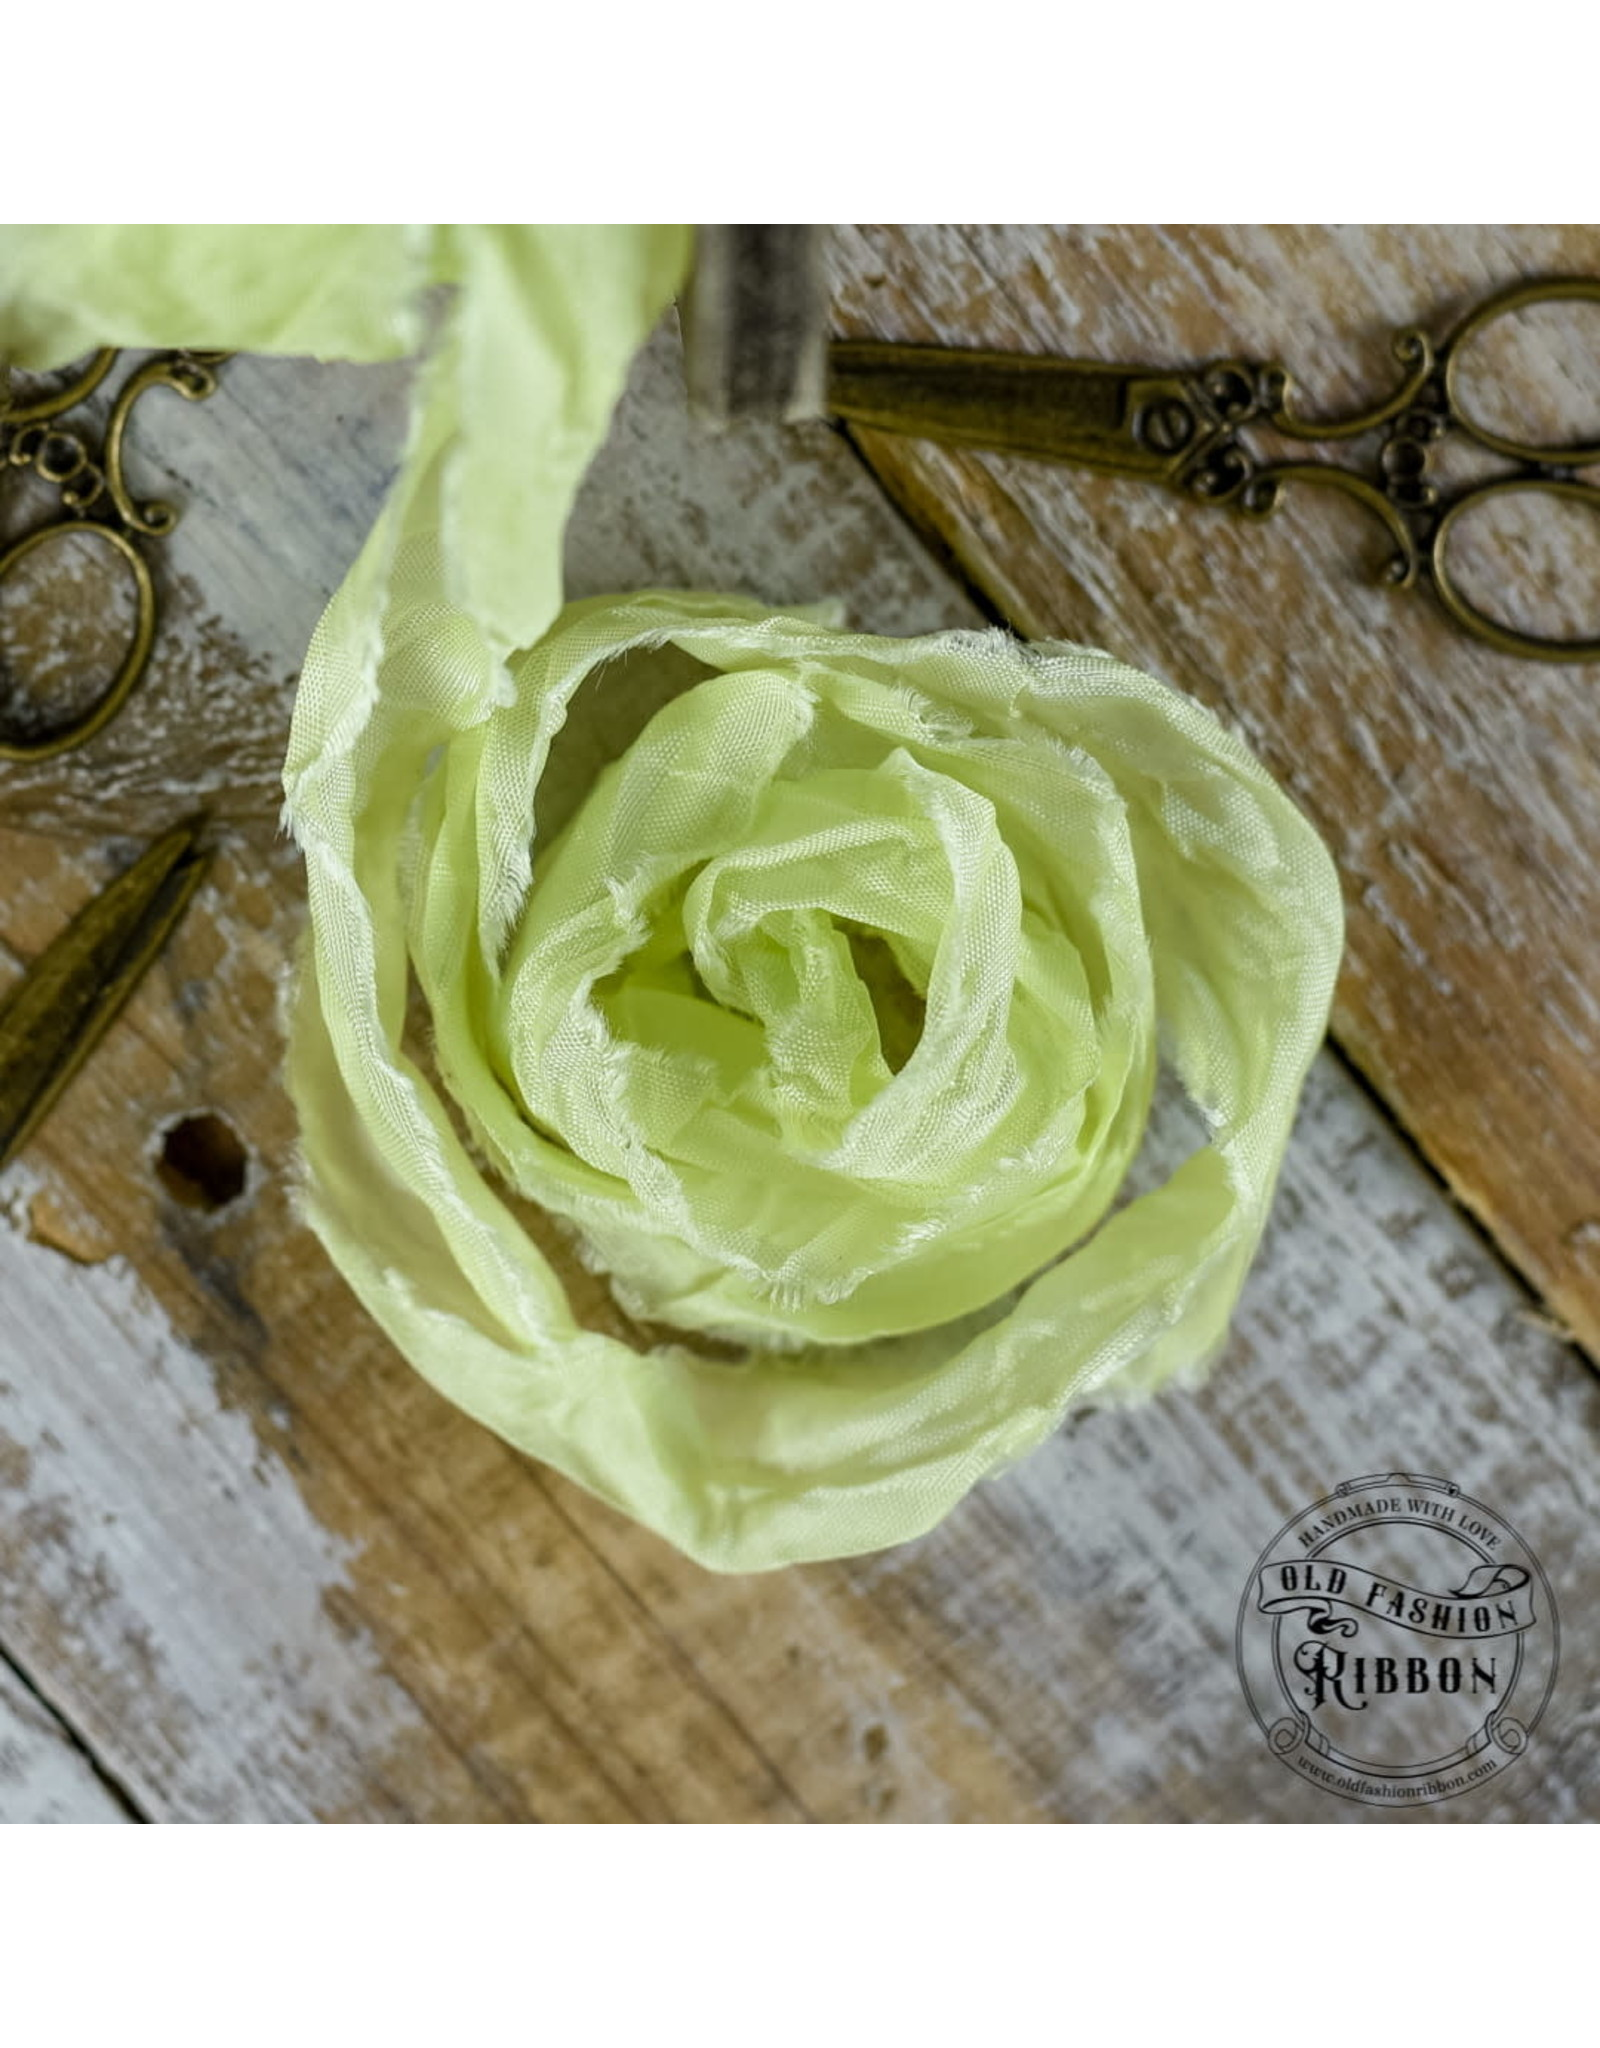 Old Fashion Ribbon Old Fashion Ribbon Satijn Light Lemon OLDSB18